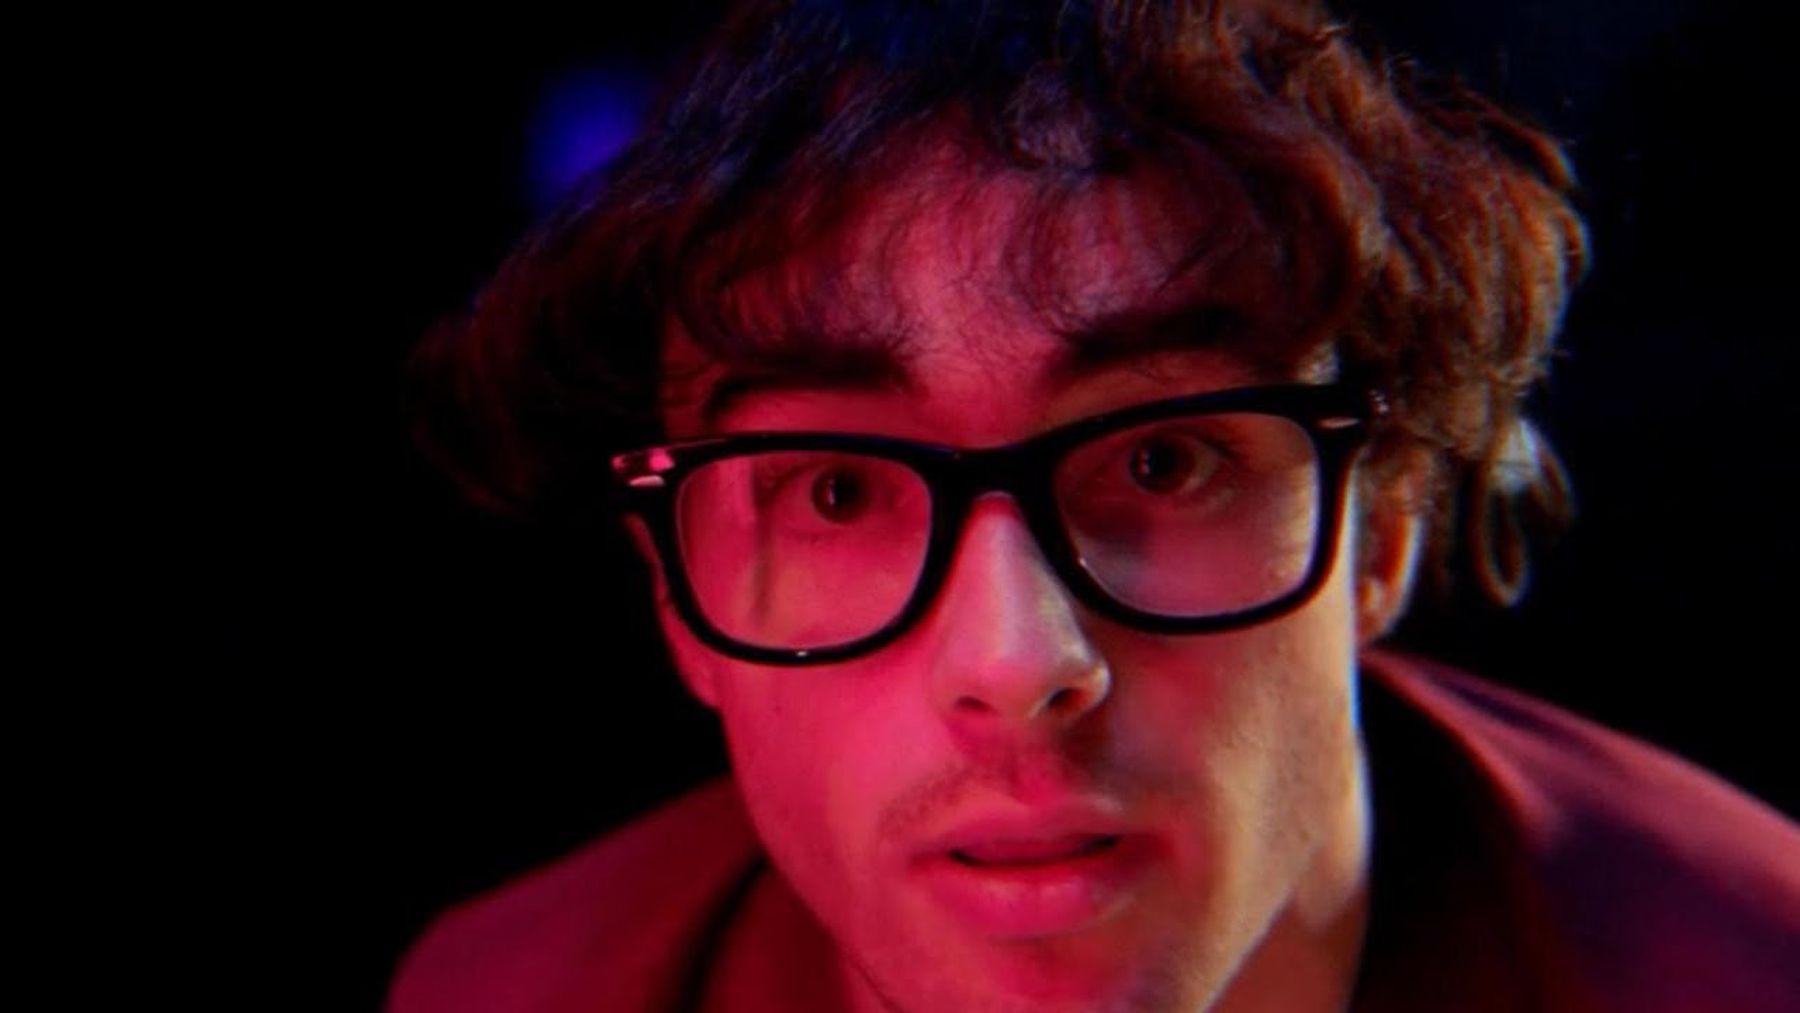 Alfie Templeman - Wait, I Lied   Musik   Was is hier eigentlich los?